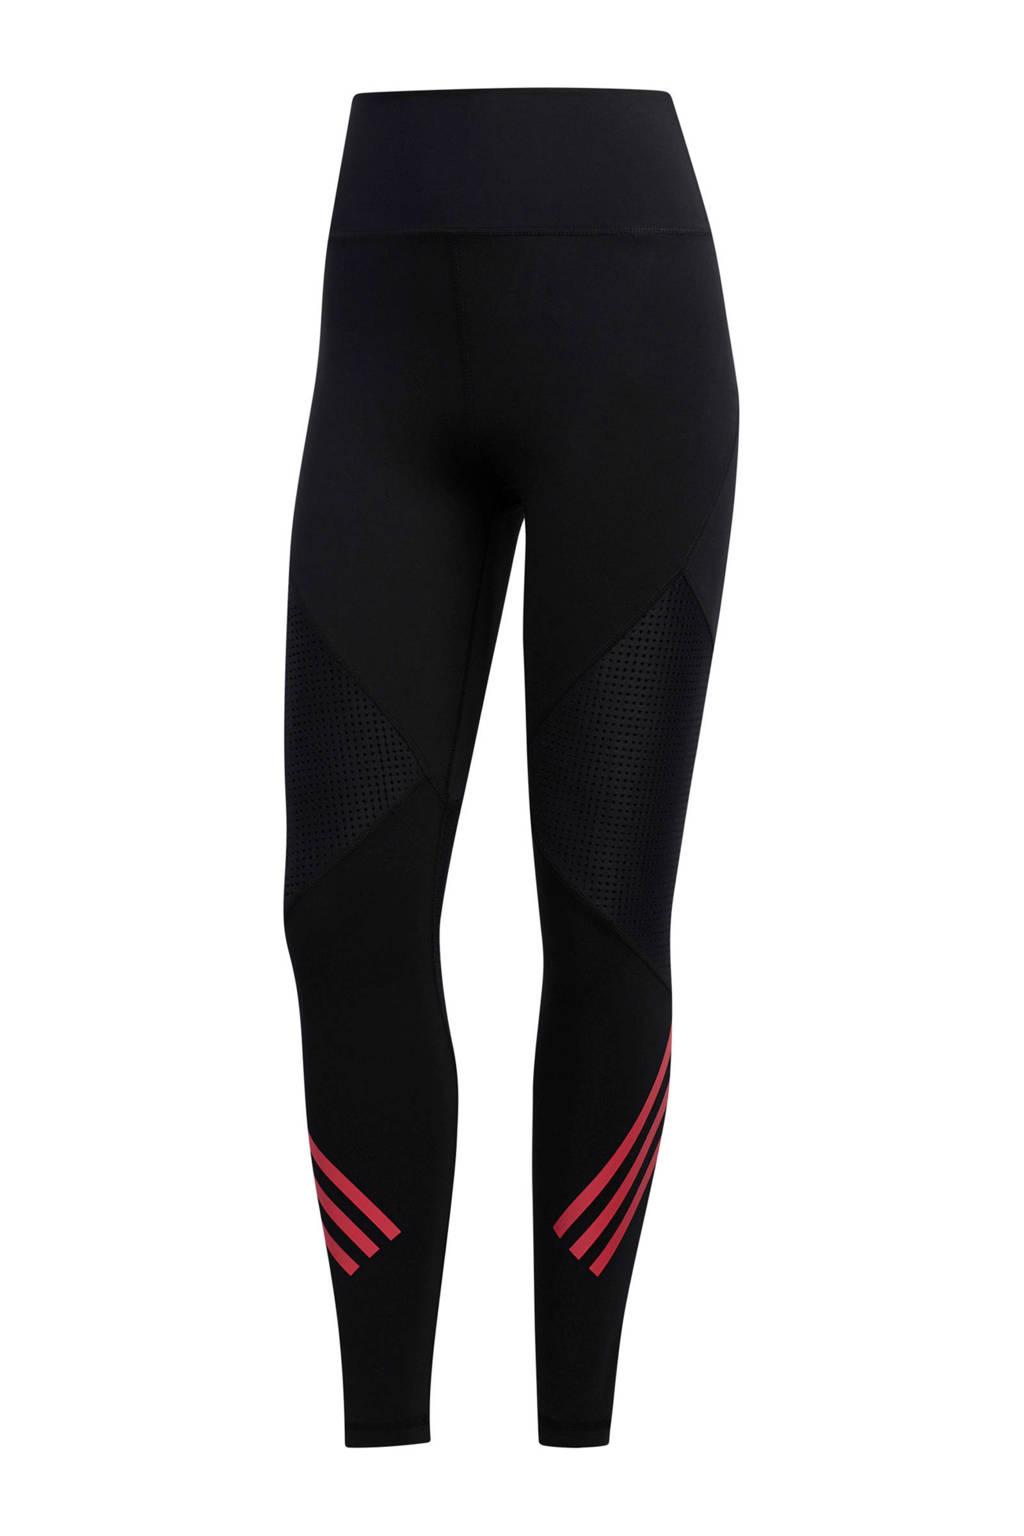 adidas performance sportlegging zwart/roze, Zwart/roze